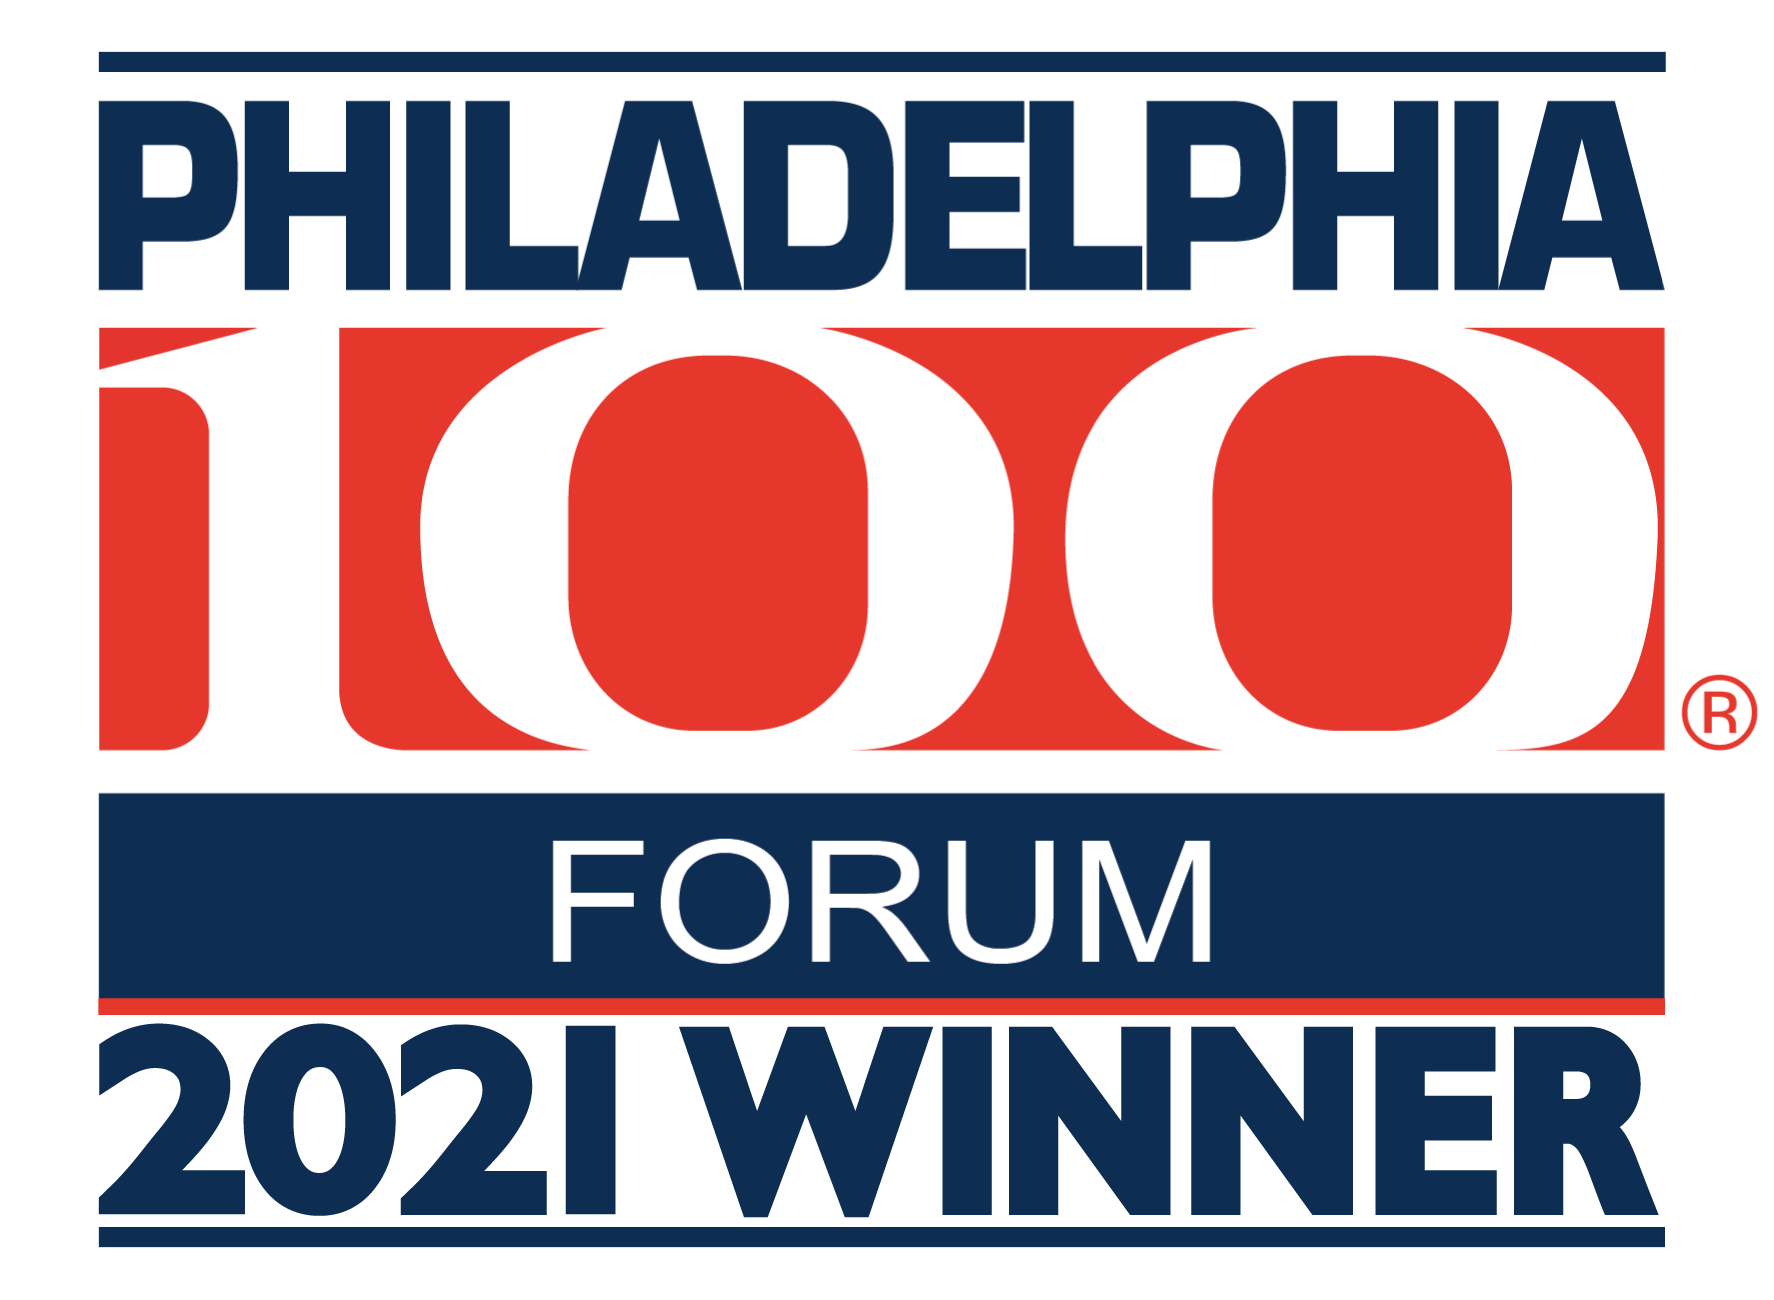 Philadelphia 100 Forum 2021 Winner | WorkPlace HCM